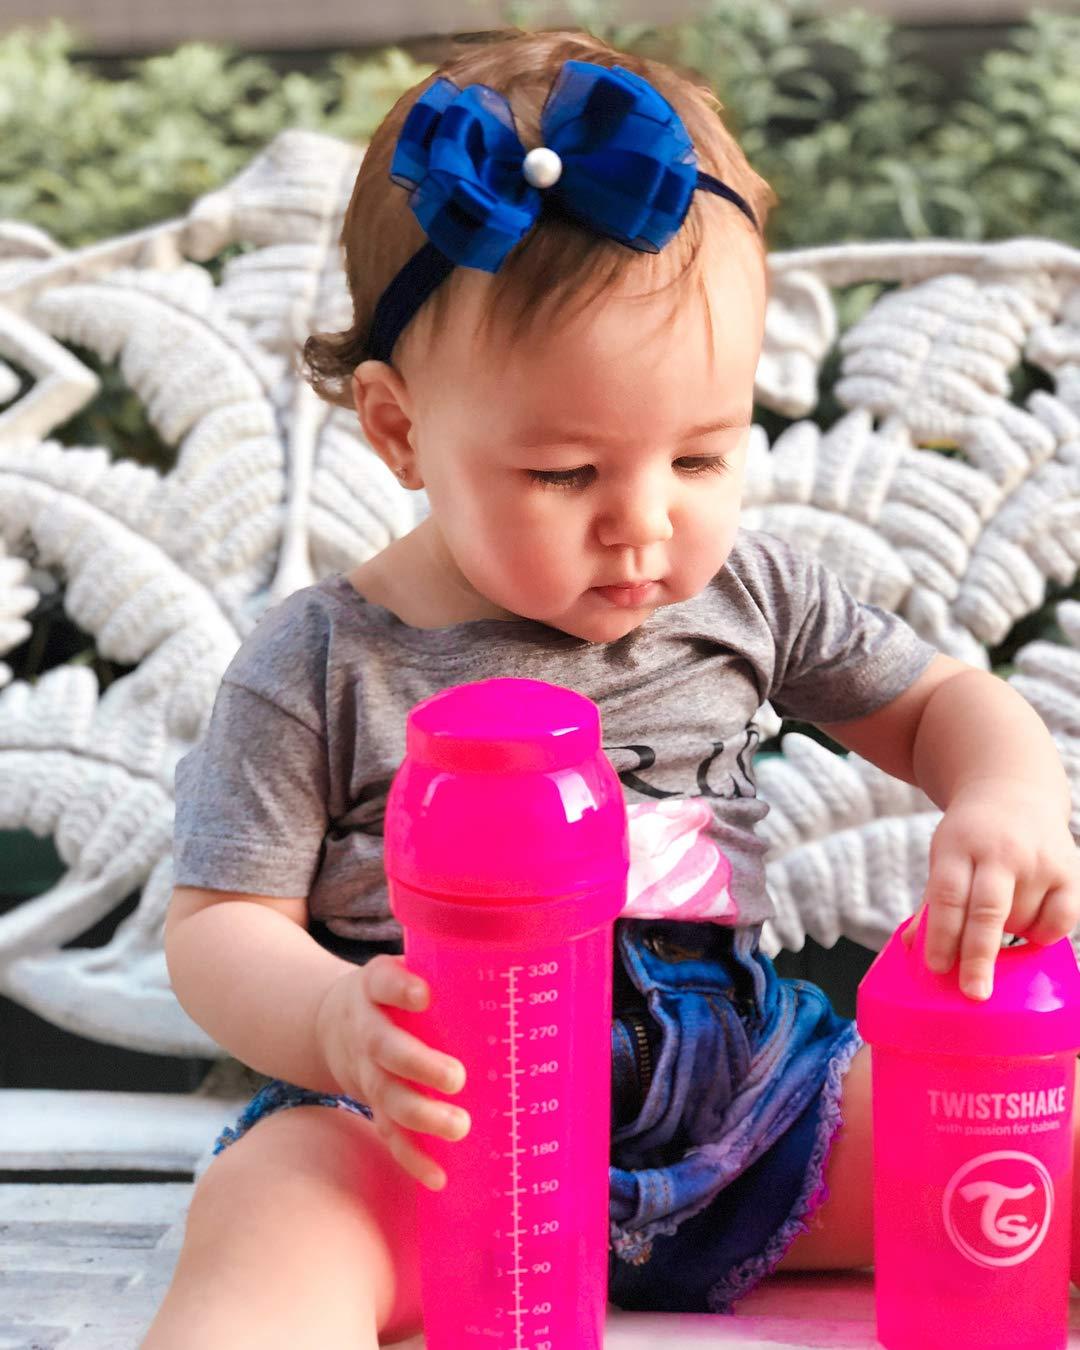 Twistshake 78013 Anti-Colic Babyflasche 330 ml//11 oz rosa